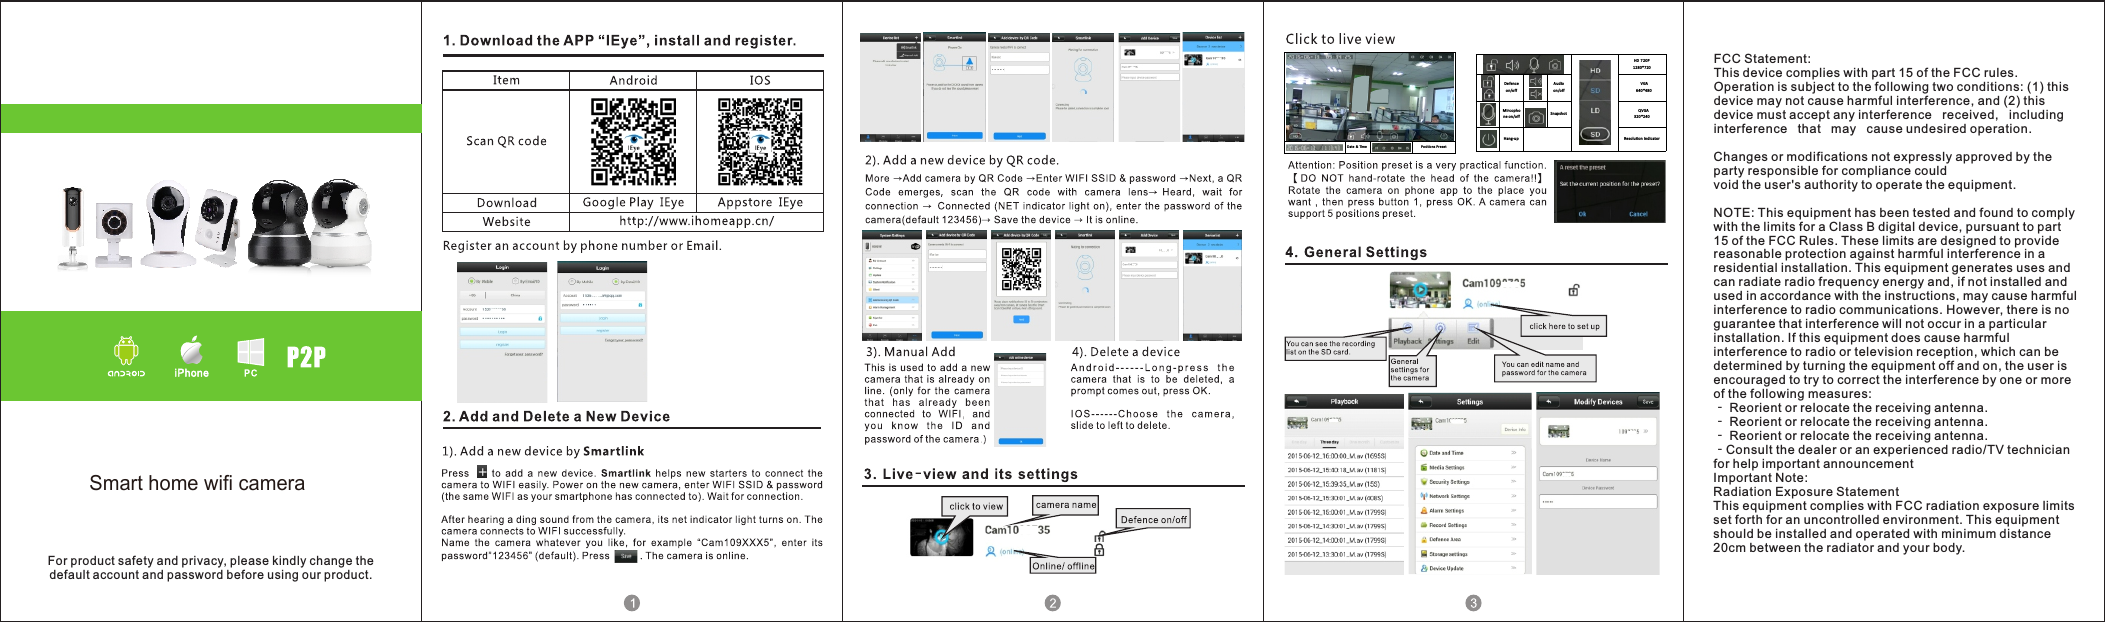 Rv manual 1989 holiday rambler motorhome owners manual array rubetek rv 3410 smart home wifi camera user manual rh usermanual wiki fandeluxe Images